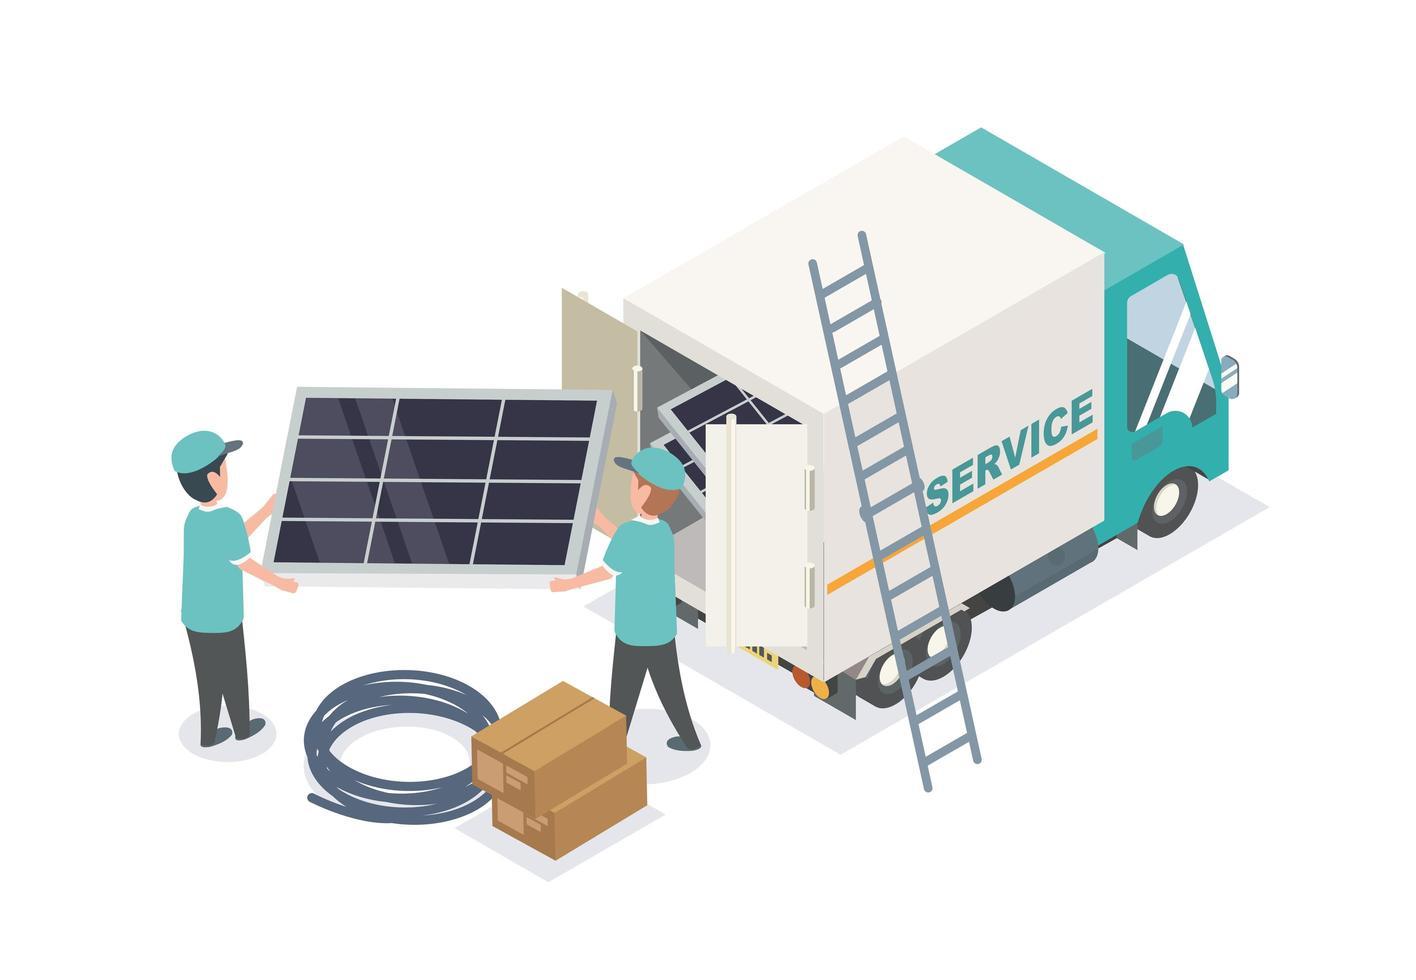 Solarzellenteam Service arbeitet vektor